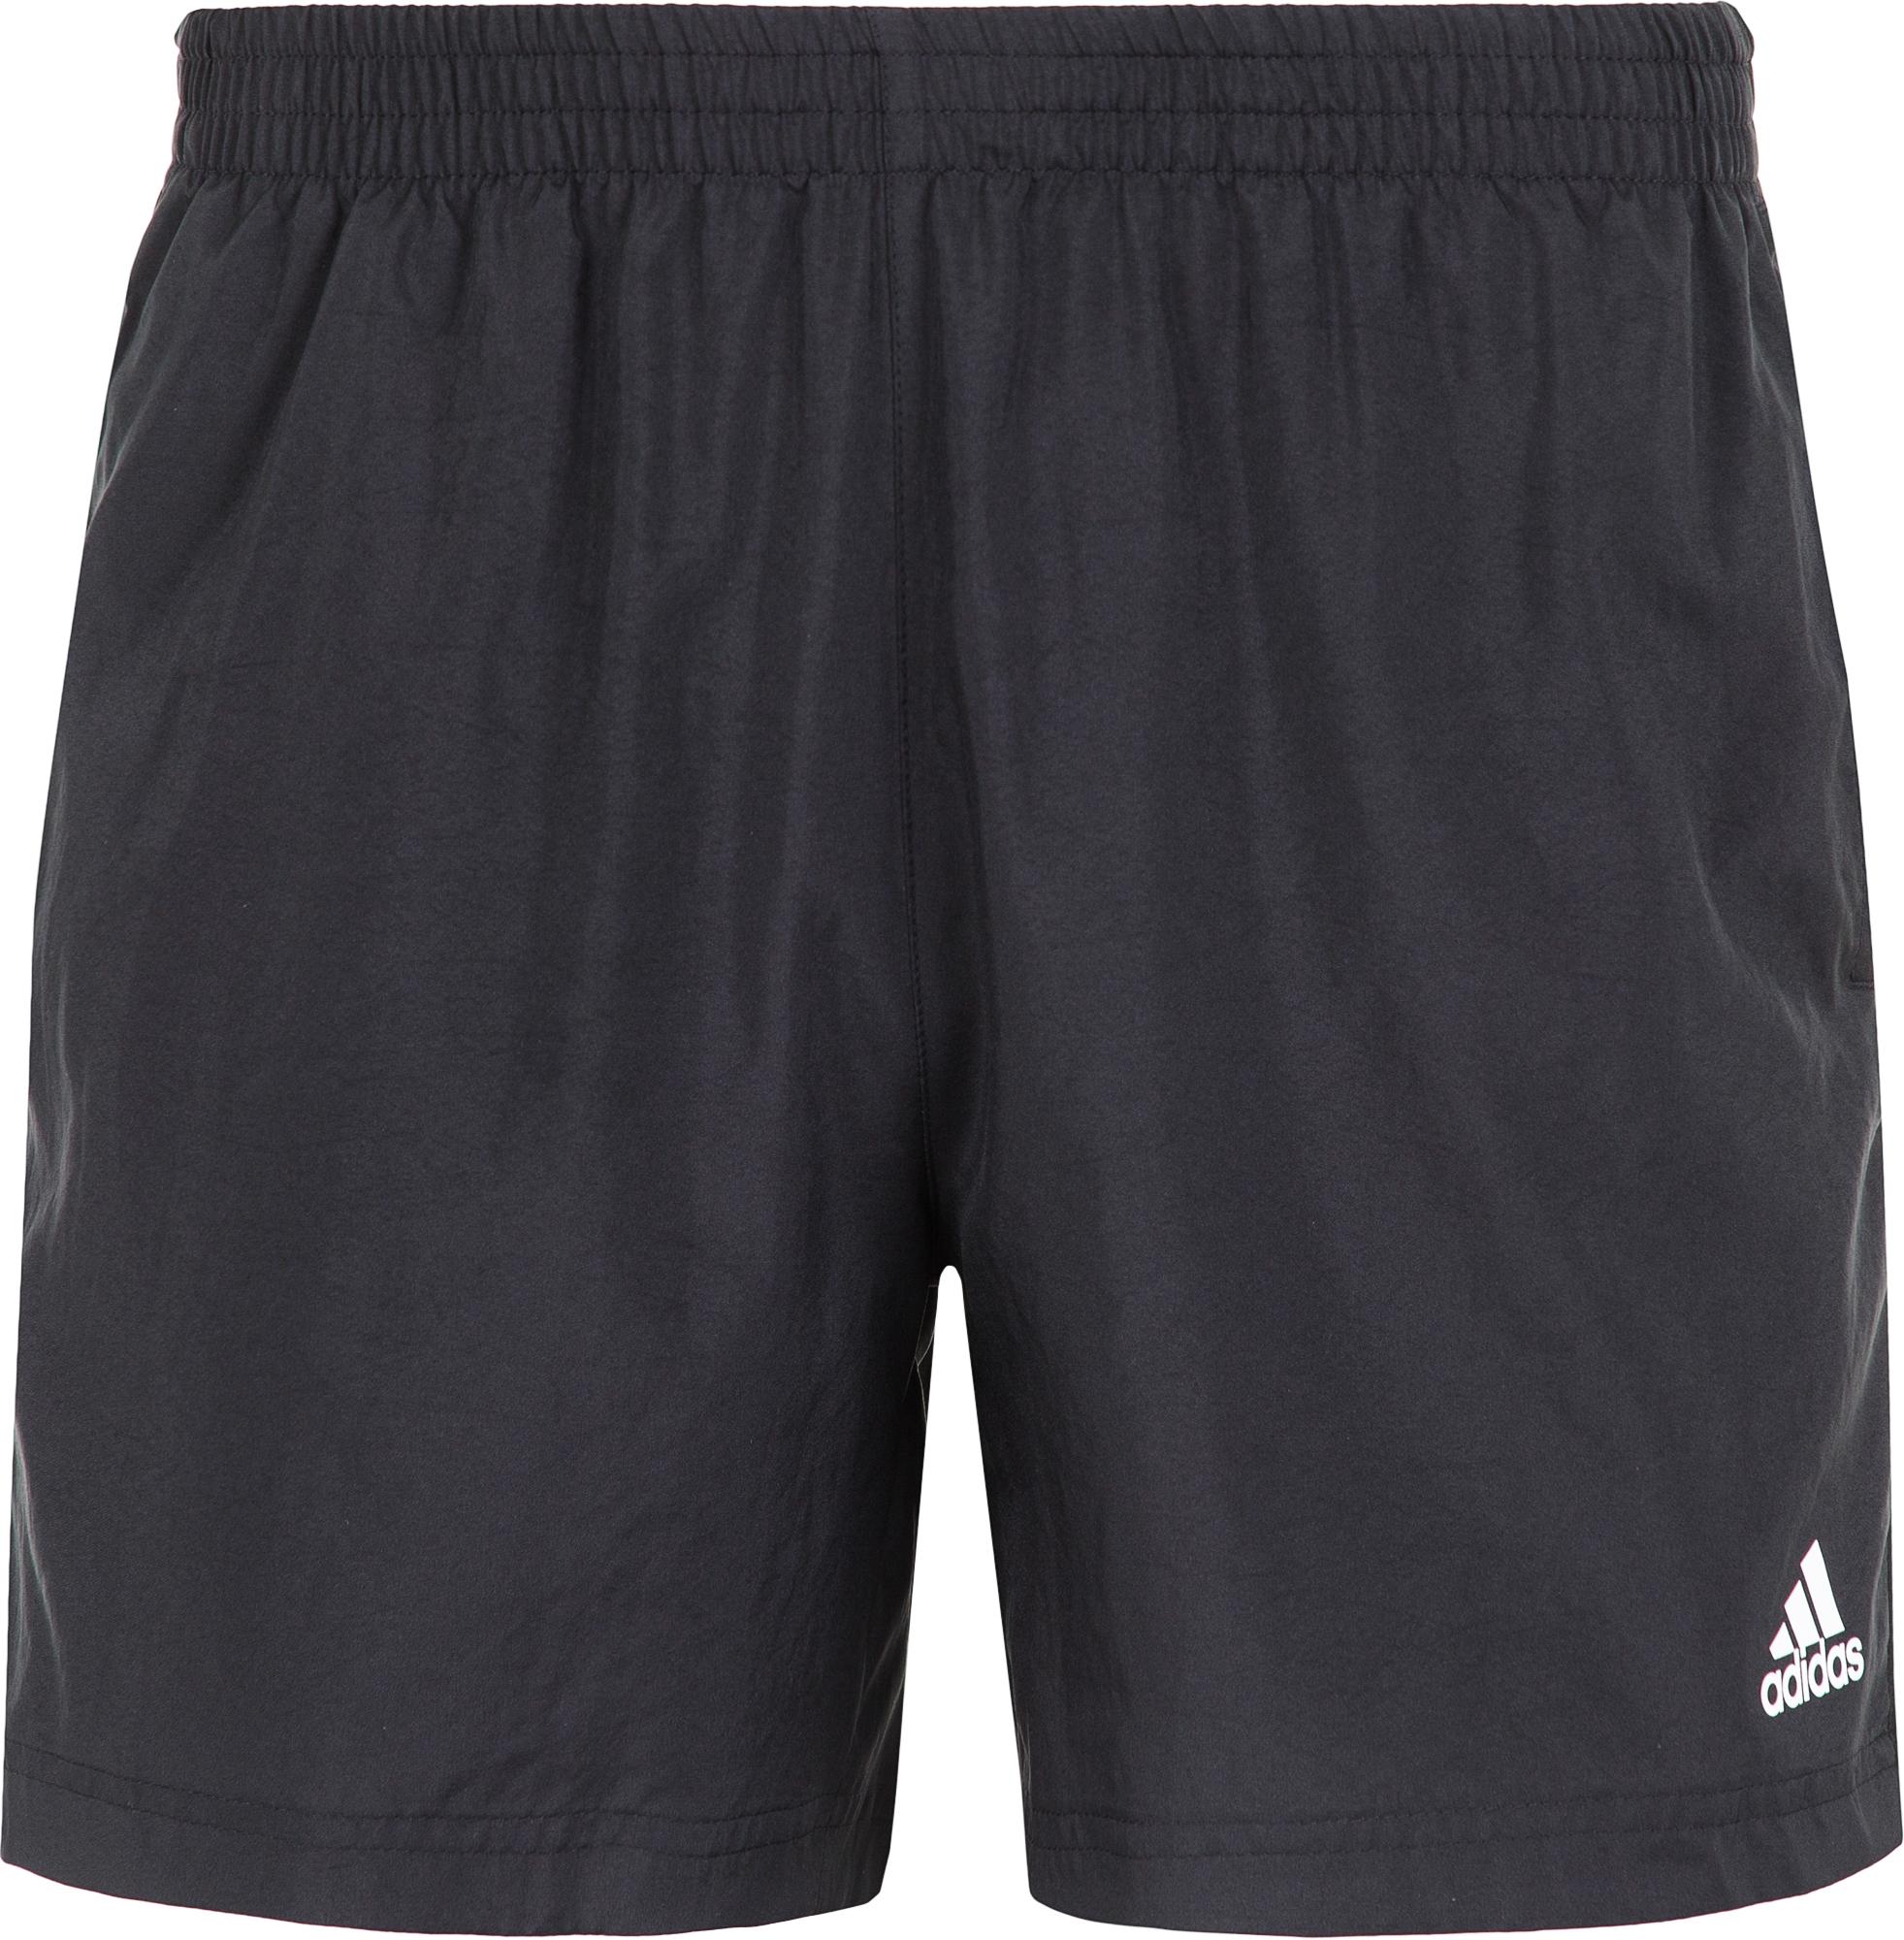 Adidas Шорты мужские Adidas Own the Run, размер 52 цены